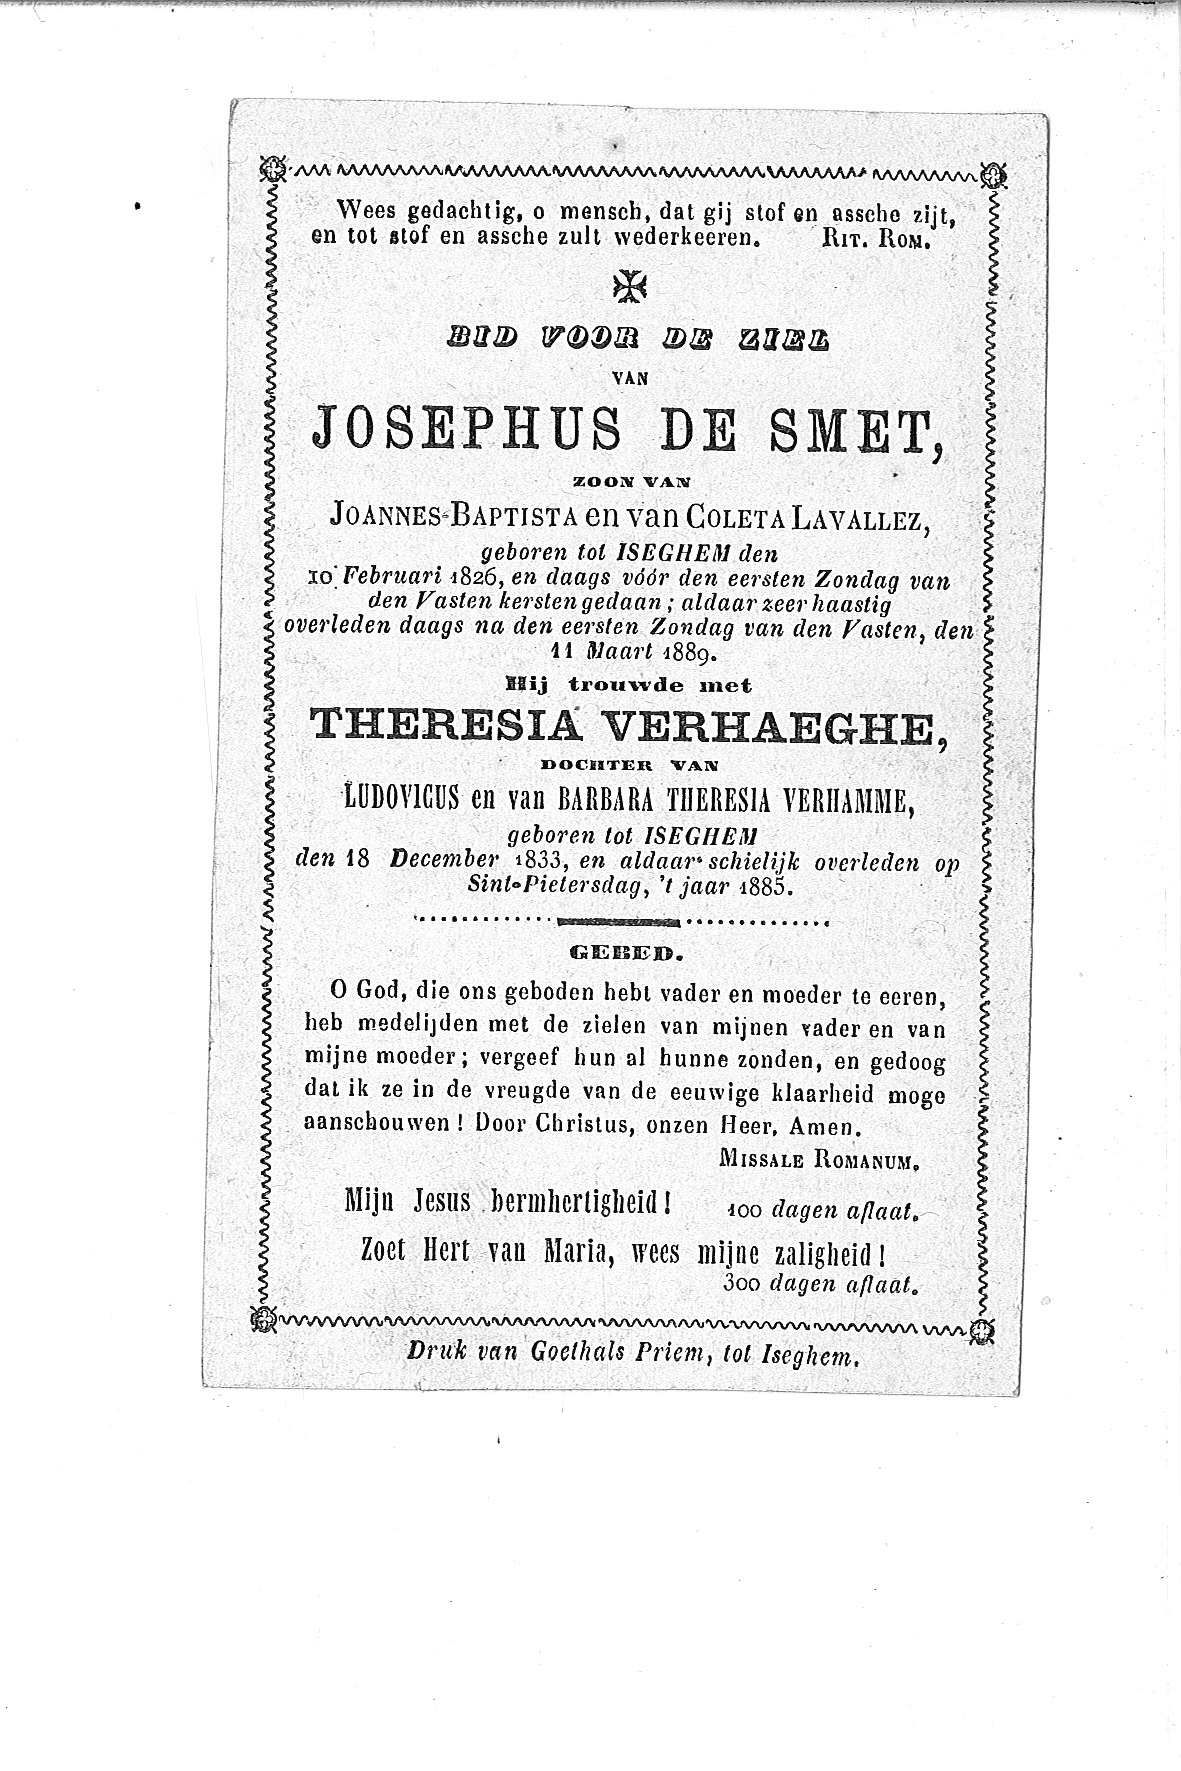 Josephus (1889) 20120502165716_00003.jpg